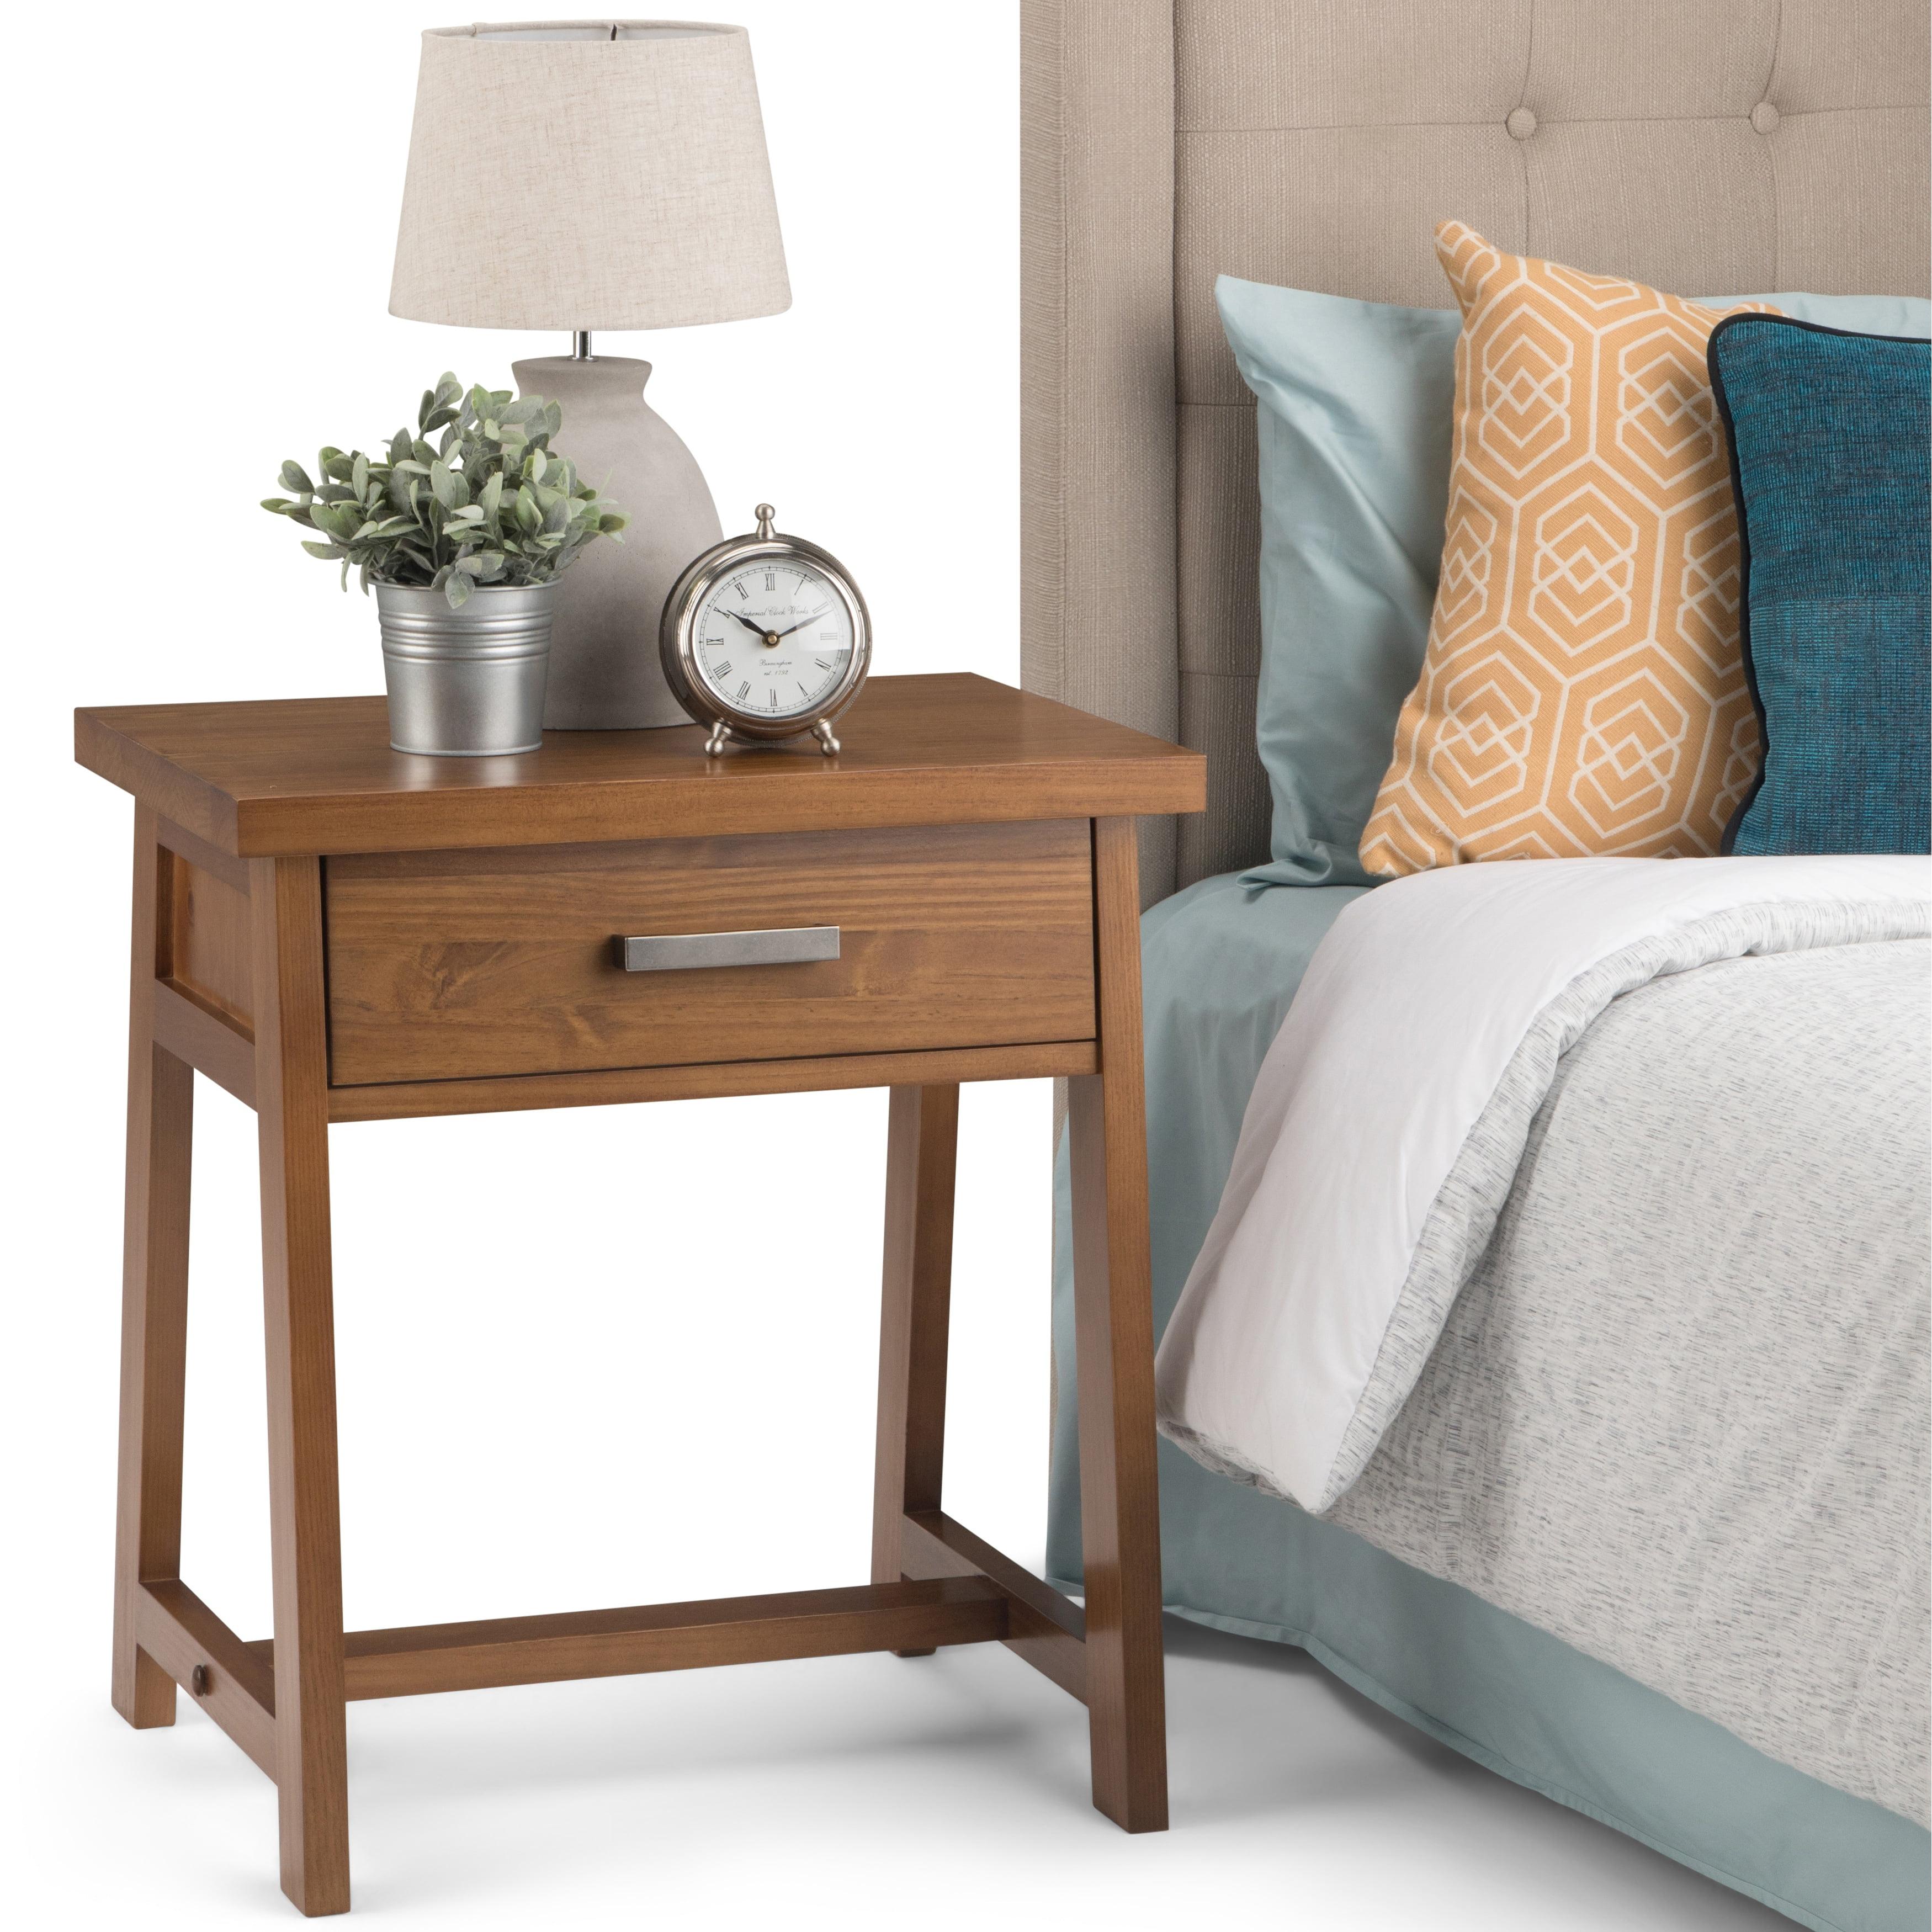 Wyndenhall Hawkins Solid Wood 24 Inch Wide Modern Industrial Bedside Nightstand Table Walmart Com Walmart Com